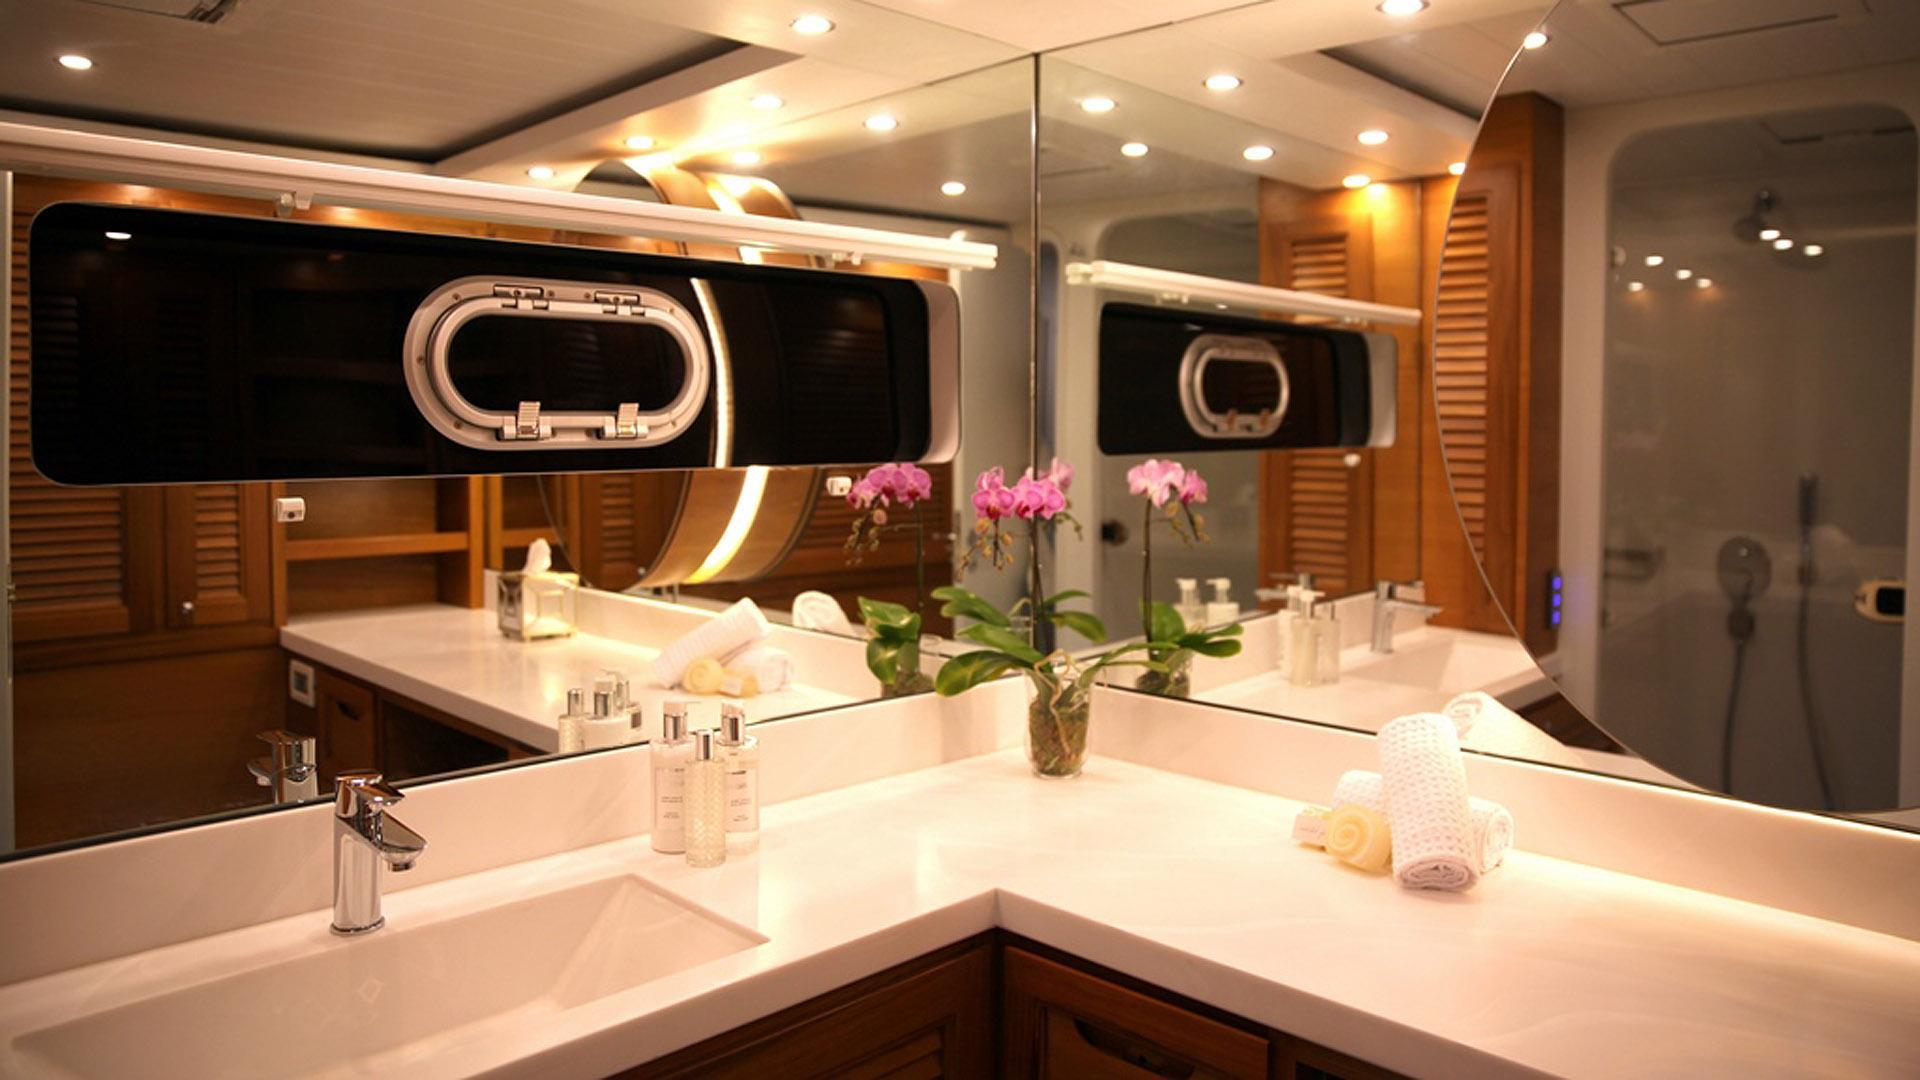 ultra vires catamaran motoryacht two oceans marine 2016 25m bath